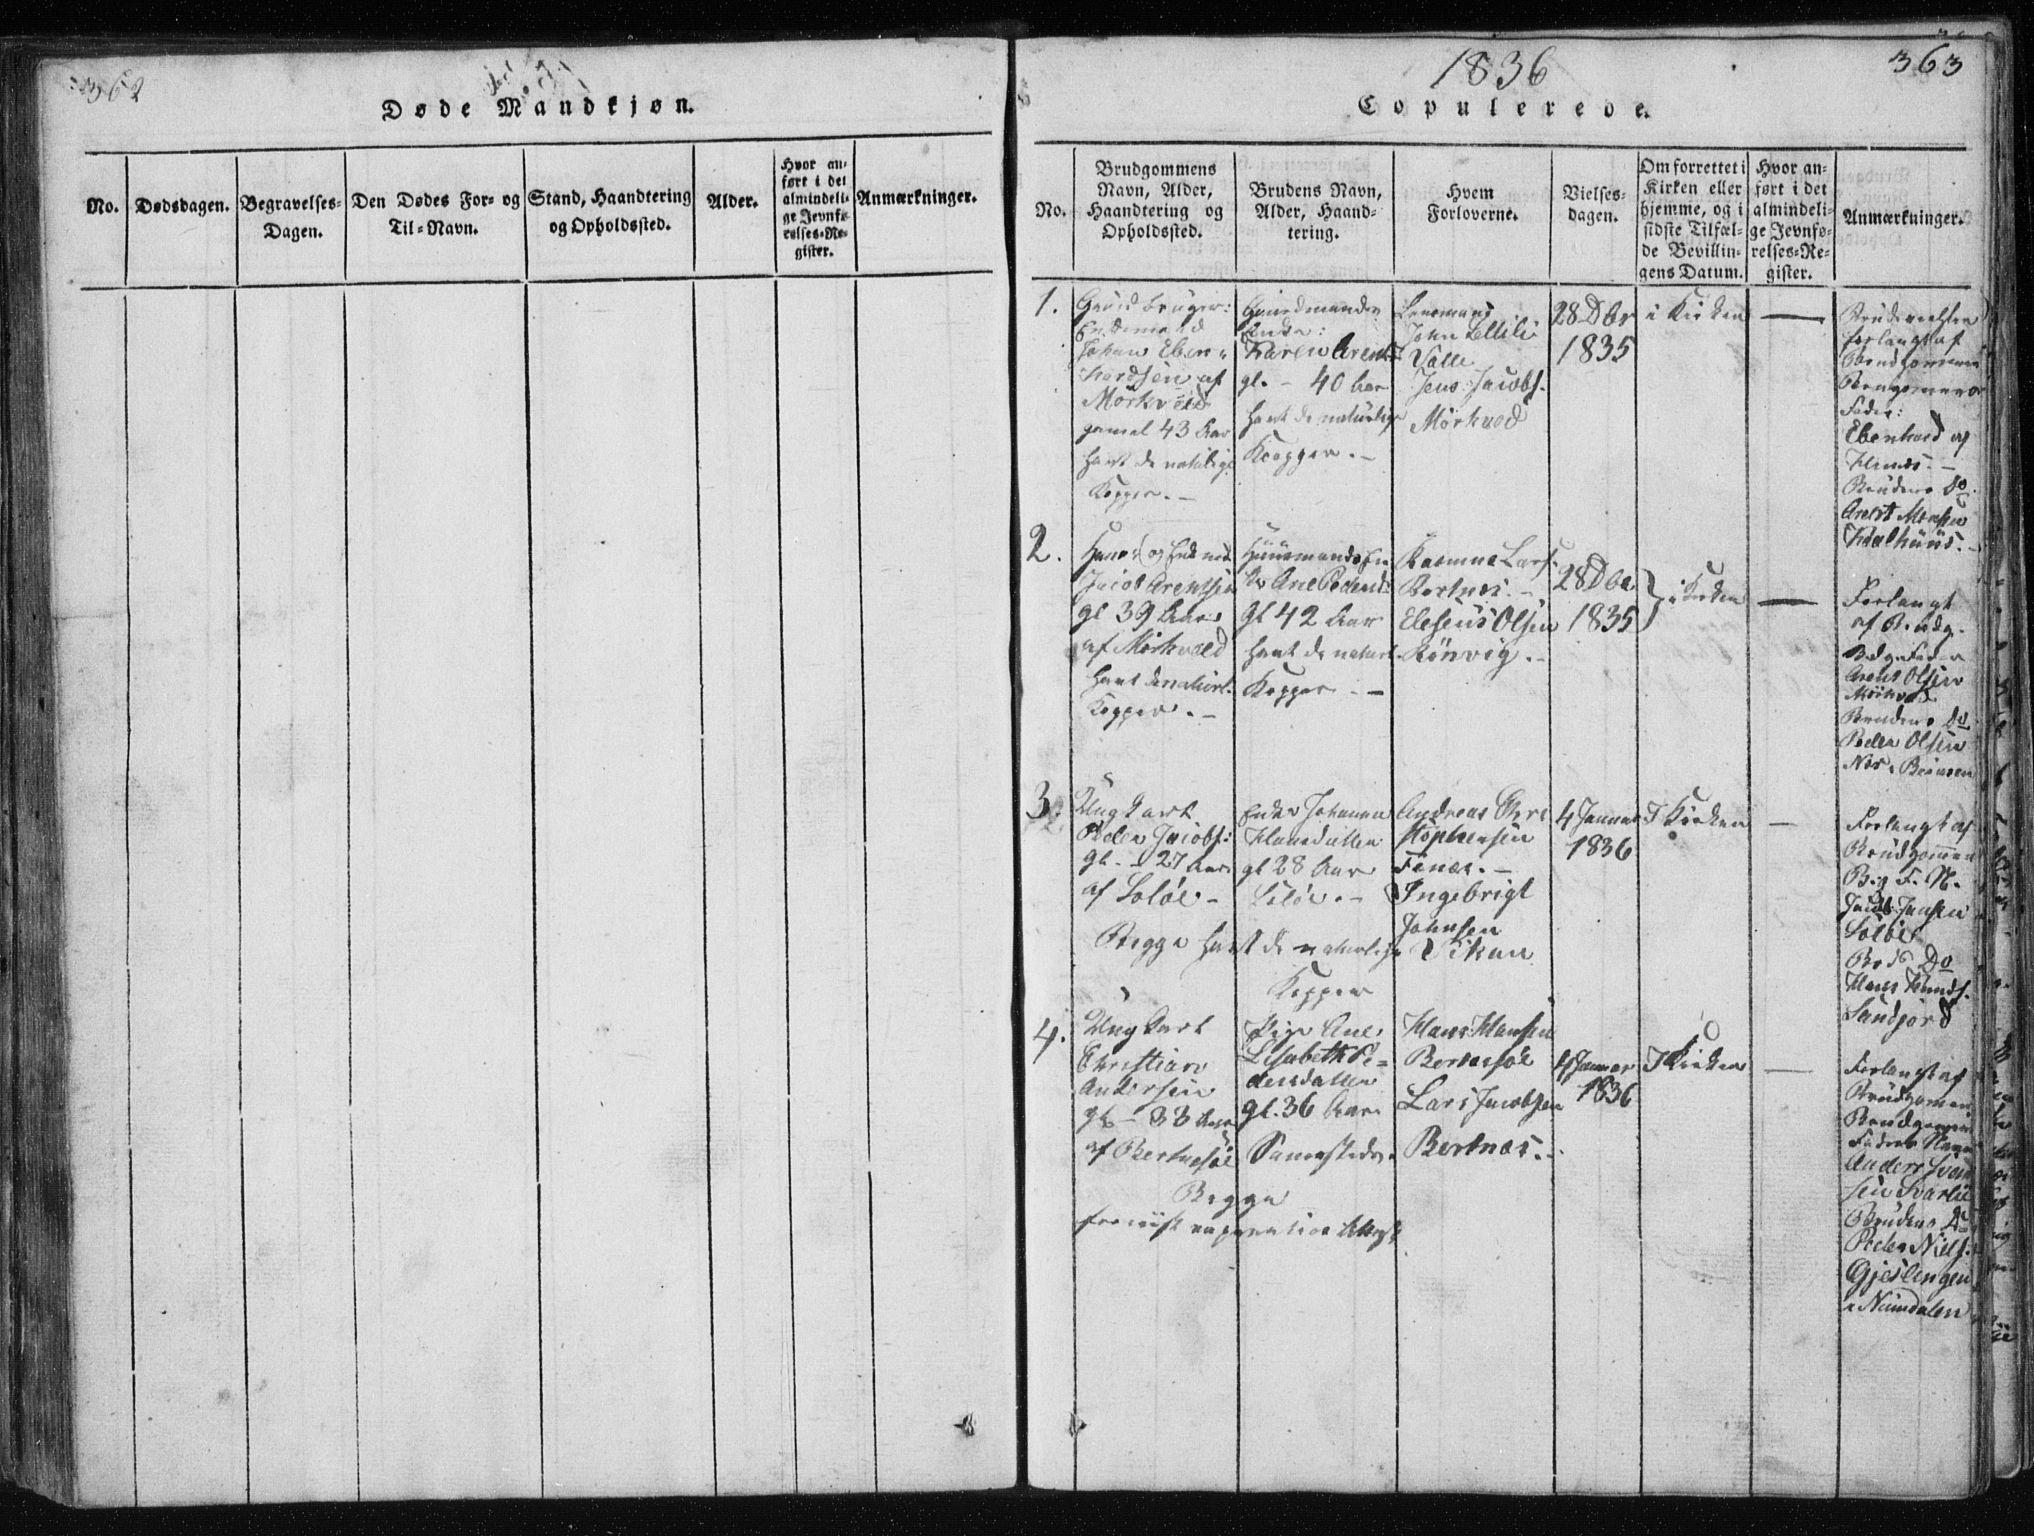 SAT, Ministerialprotokoller, klokkerbøker og fødselsregistre - Nordland, 801/L0027: Klokkerbok nr. 801C02, 1835-1845, s. 362-363